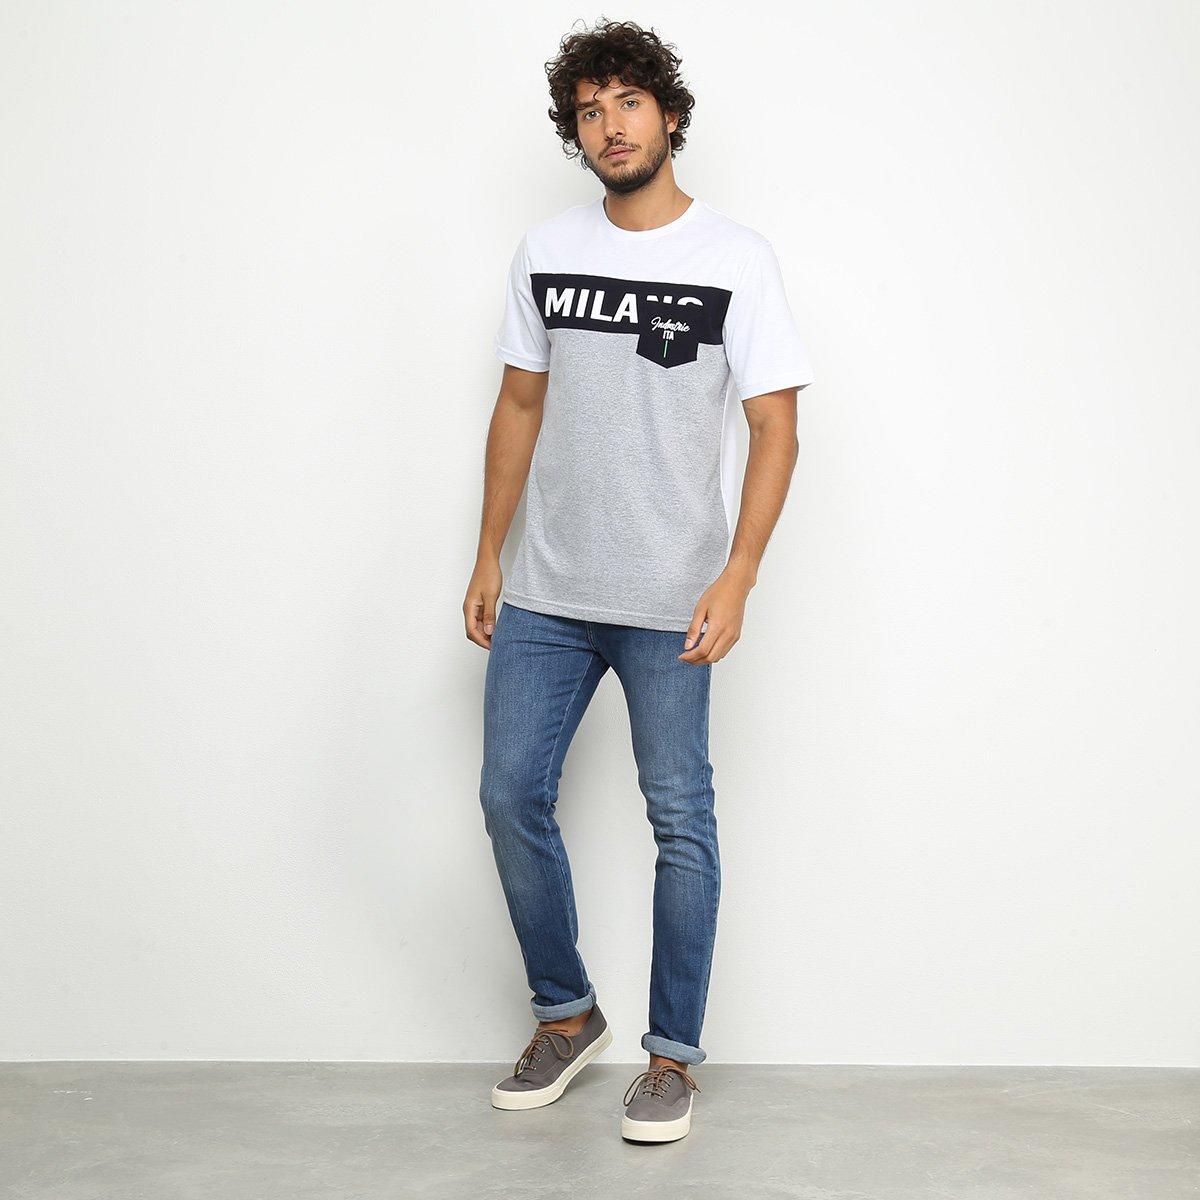 Camiseta Industrie Milano Masculina - Branco e Marinho